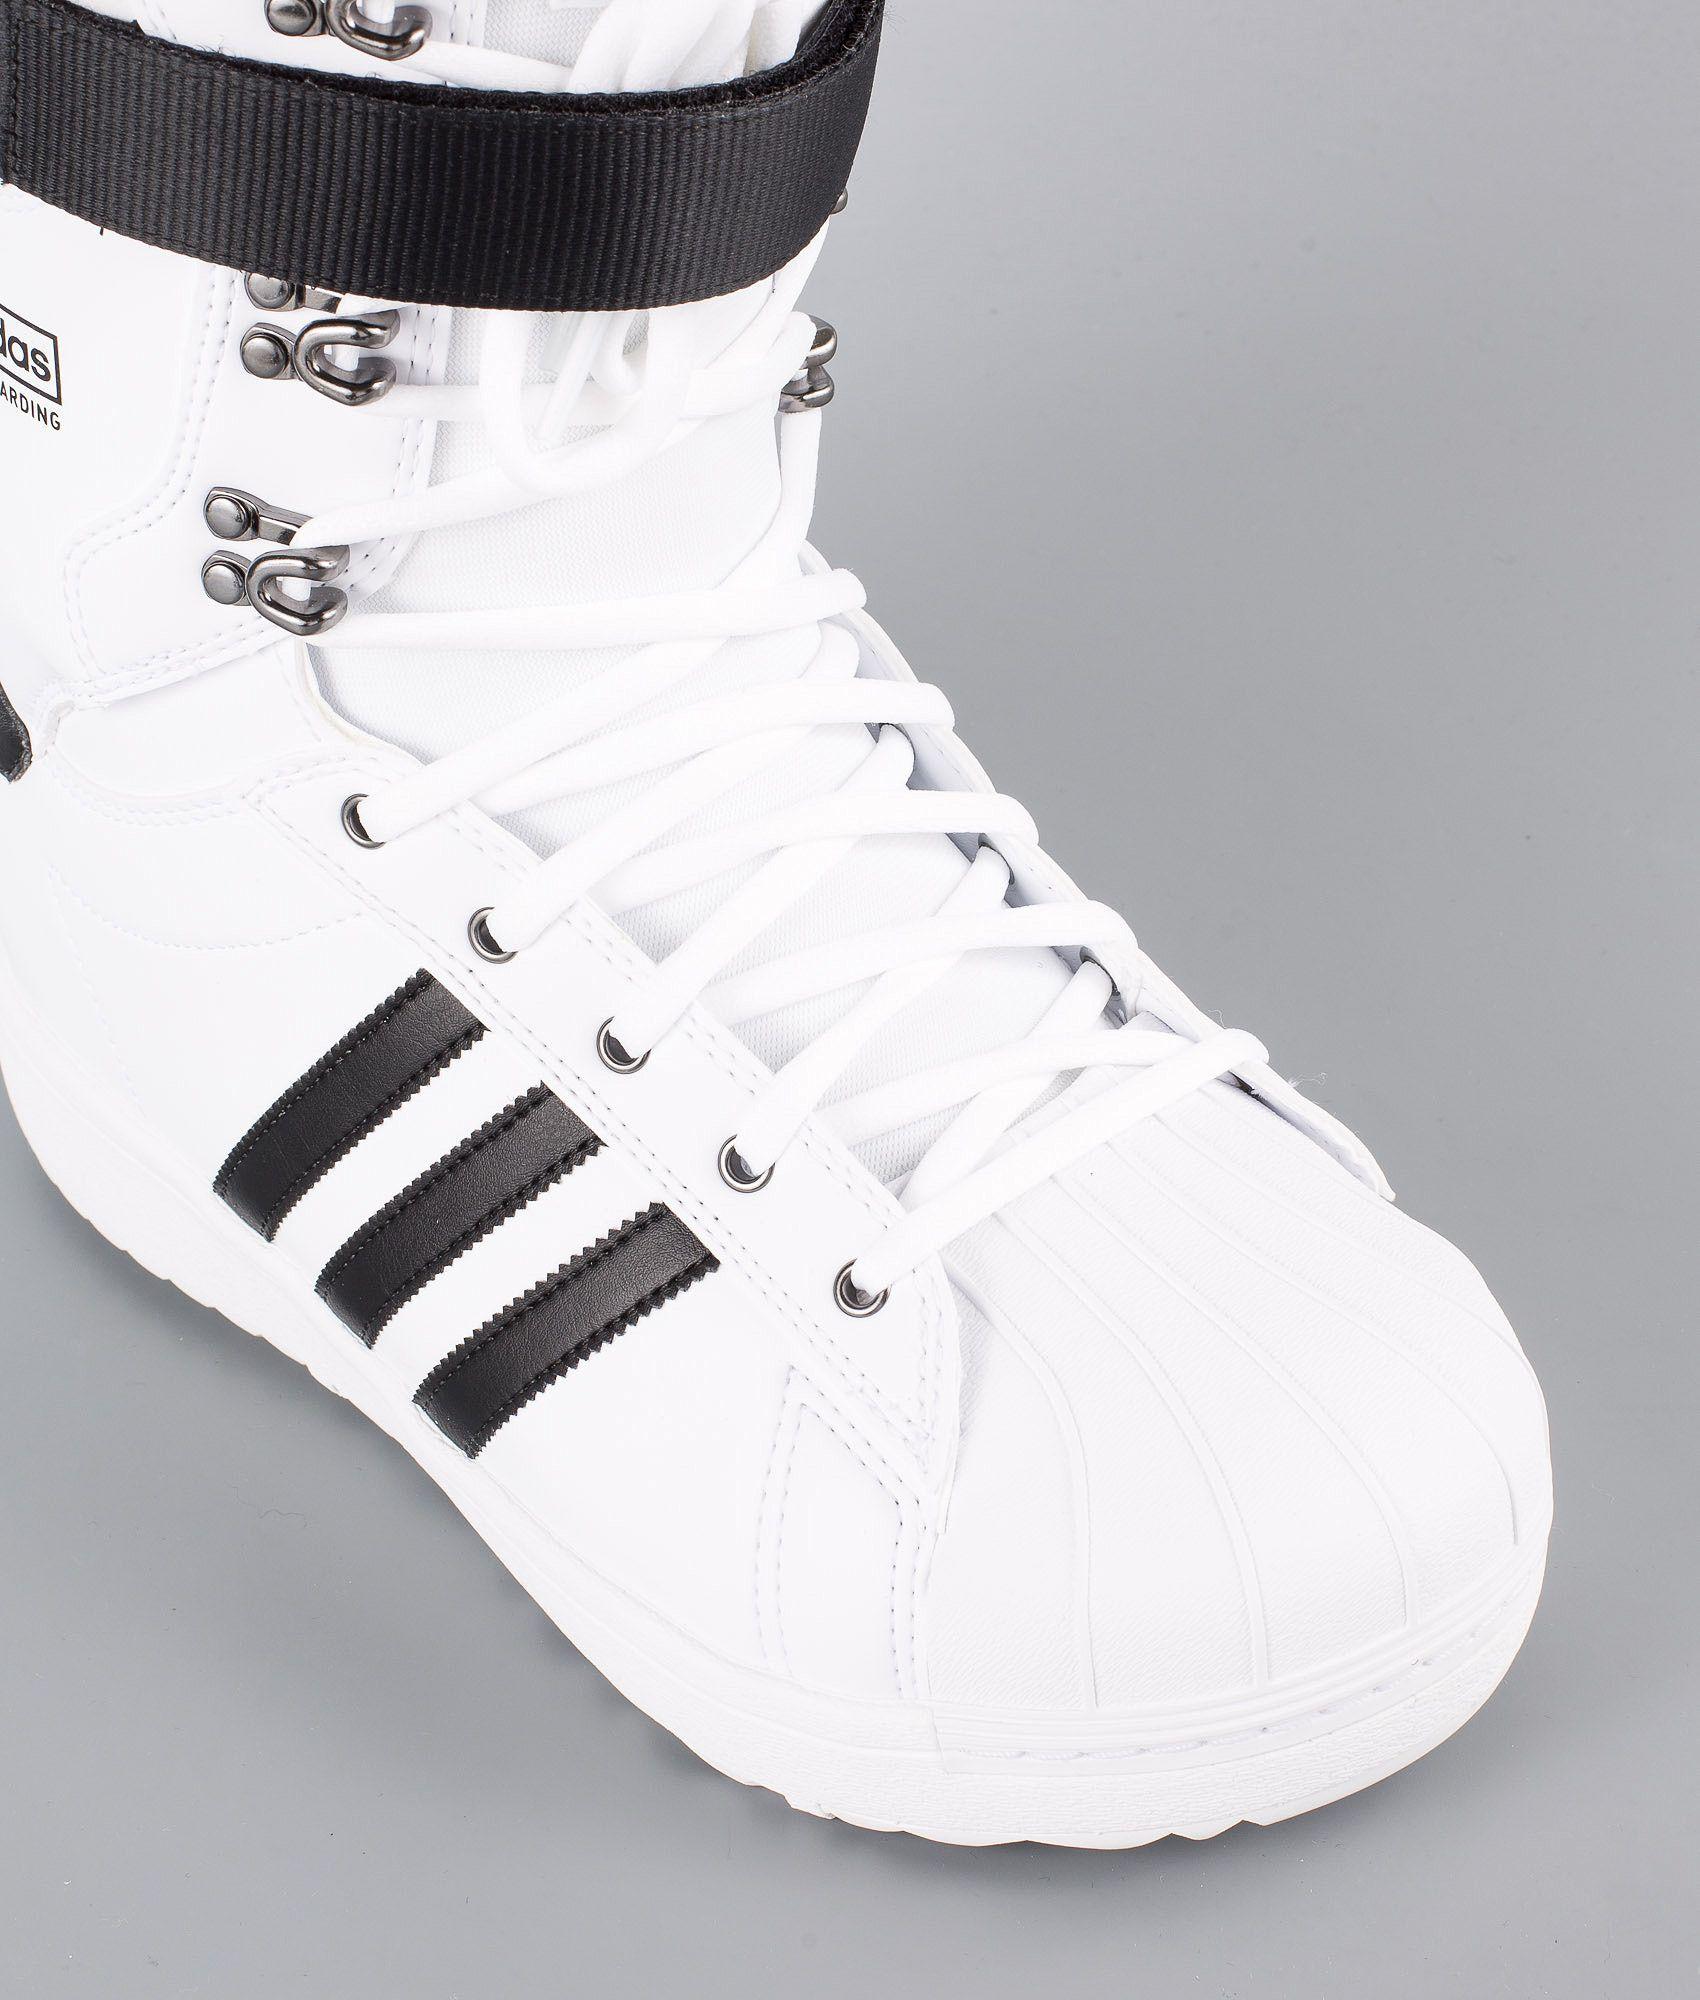 finest selection a3230 5005e Adidas Snowboarding Superstar Adv Snowboard Boots Adidas Superstar,  Lumilautailu, Adidaksen Jalkineet